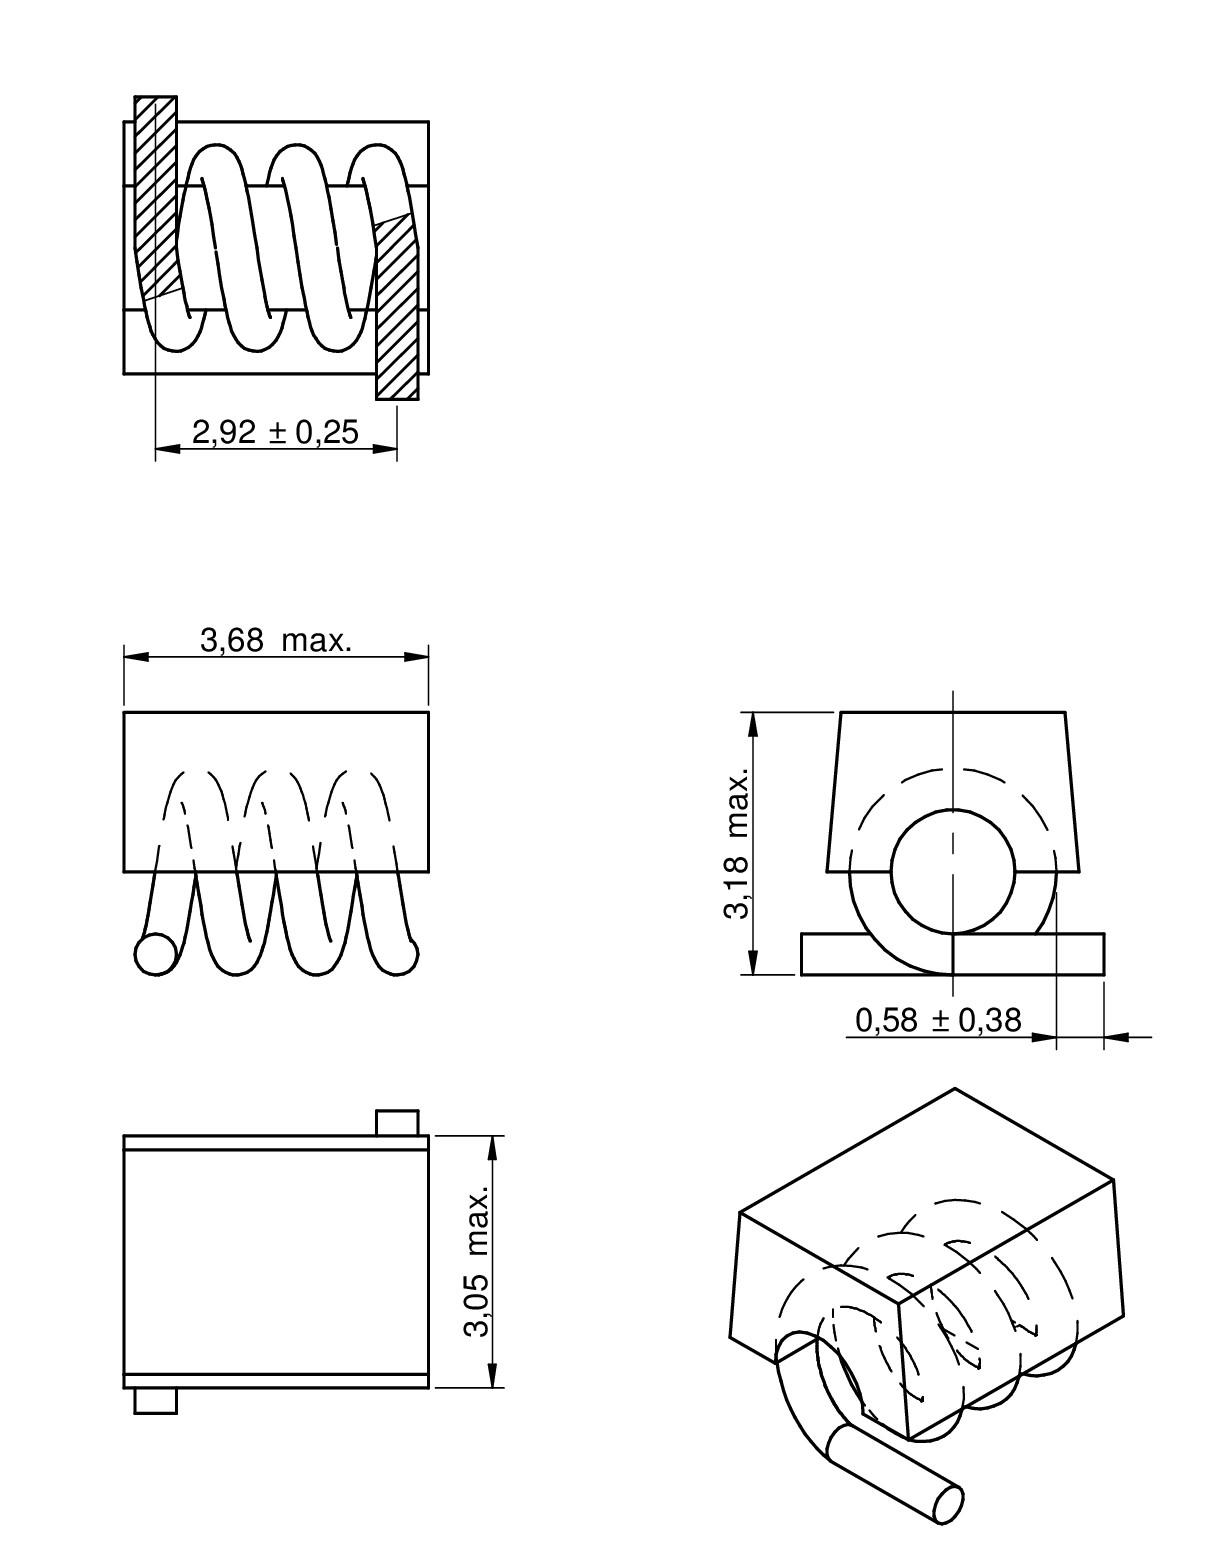 WE-CAIR Air coil   Passive Components   Würth Elektronik Standard Parts